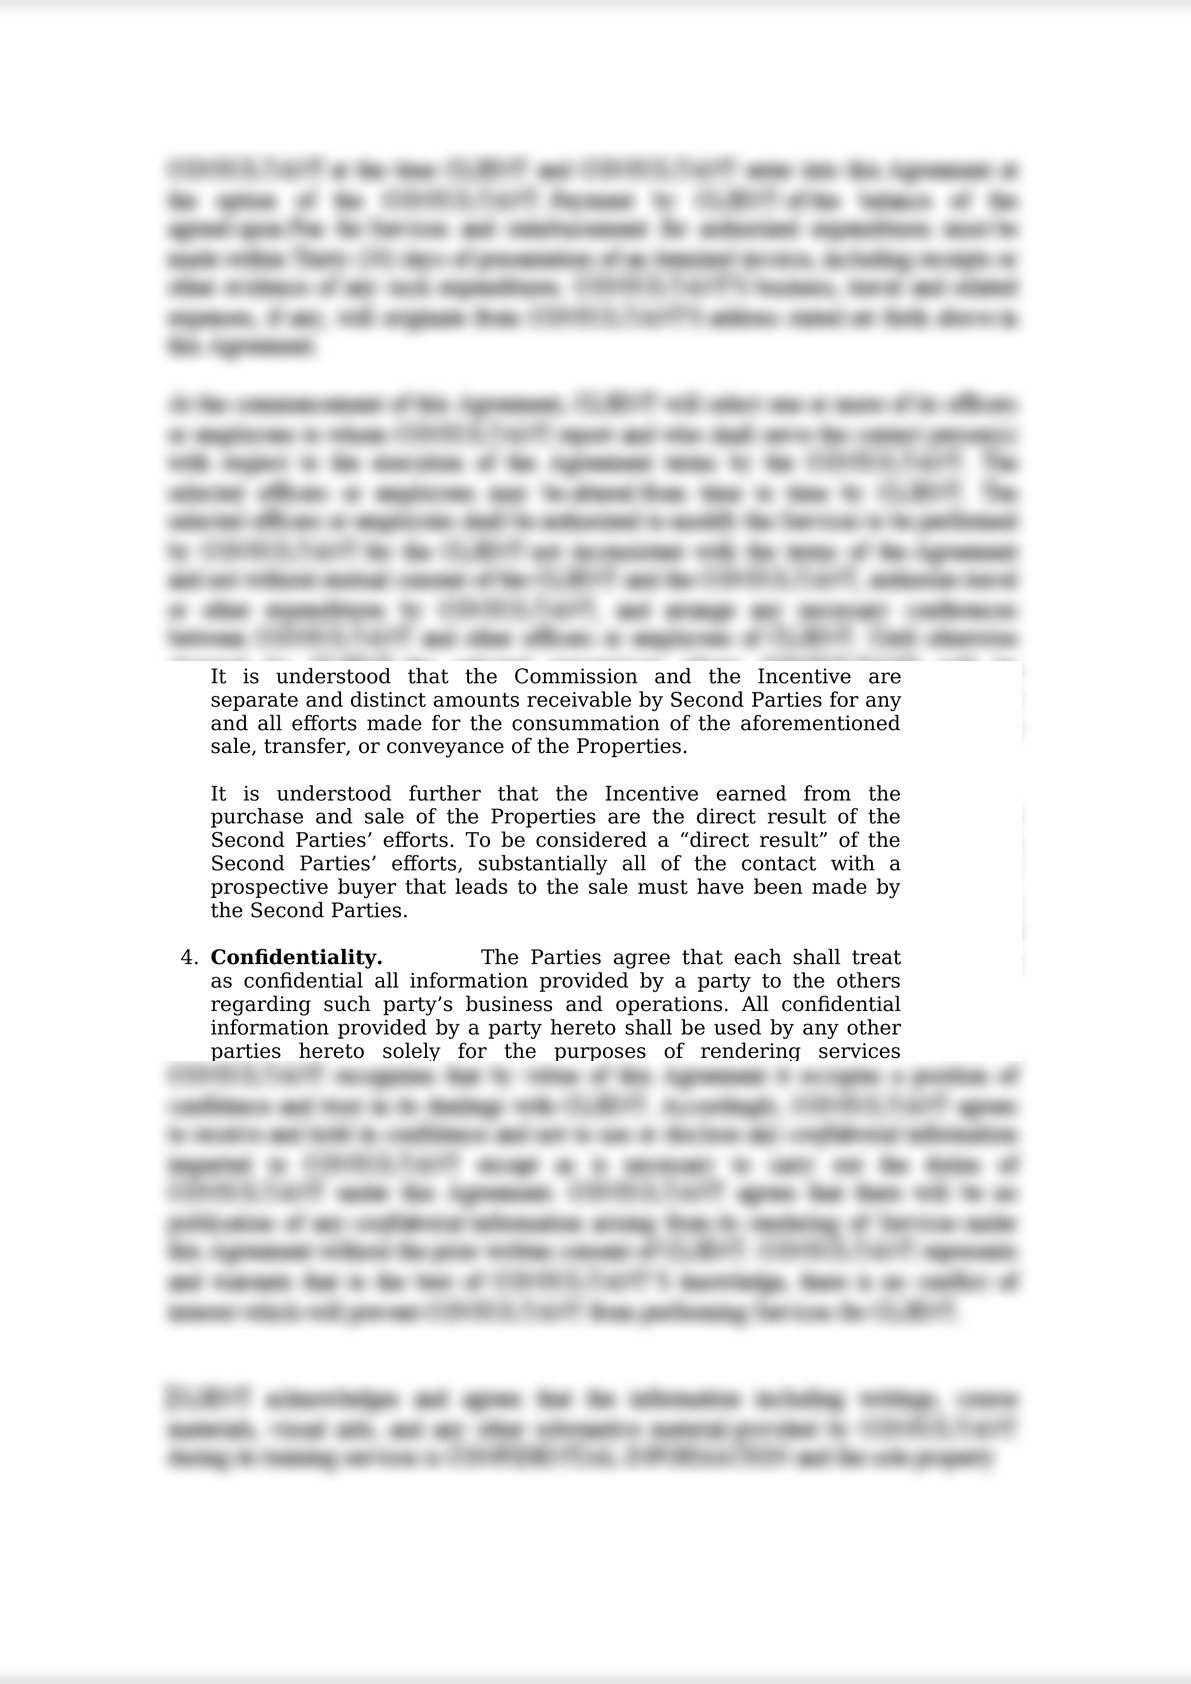 Memorandum of Agreement - Broker's Compensation and Profit-Sharing Scheme-0